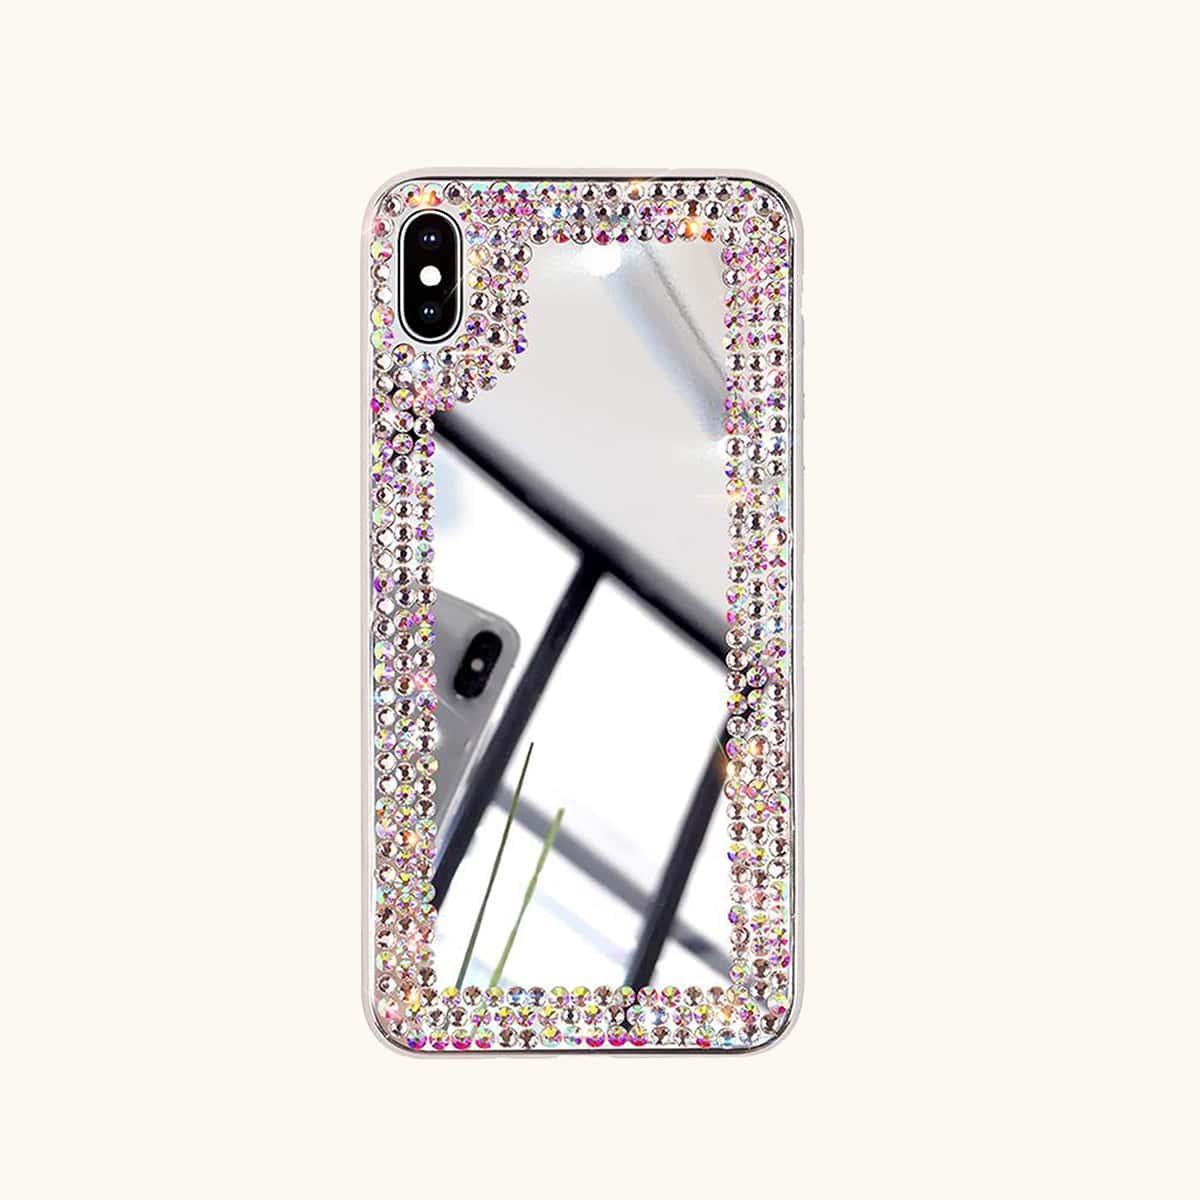 Strass Spiegel Oberfläche iPhone Hülle